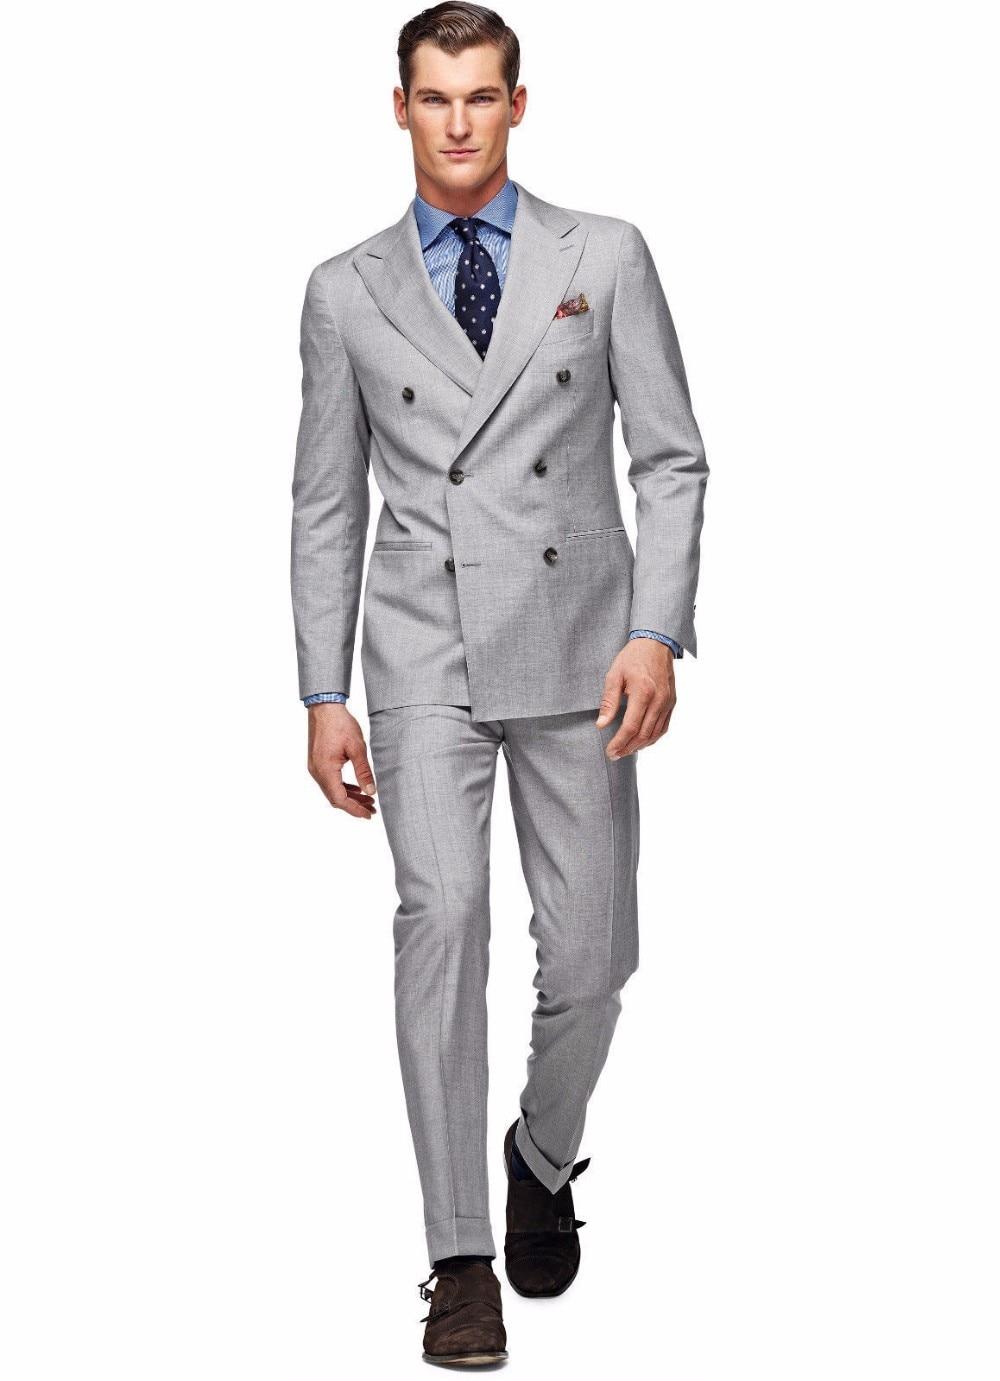 Chaqueta de esmoquin gris claro para hombre (chaqueta + Pantalones + corbata + pañuelos) personalizada para hombre